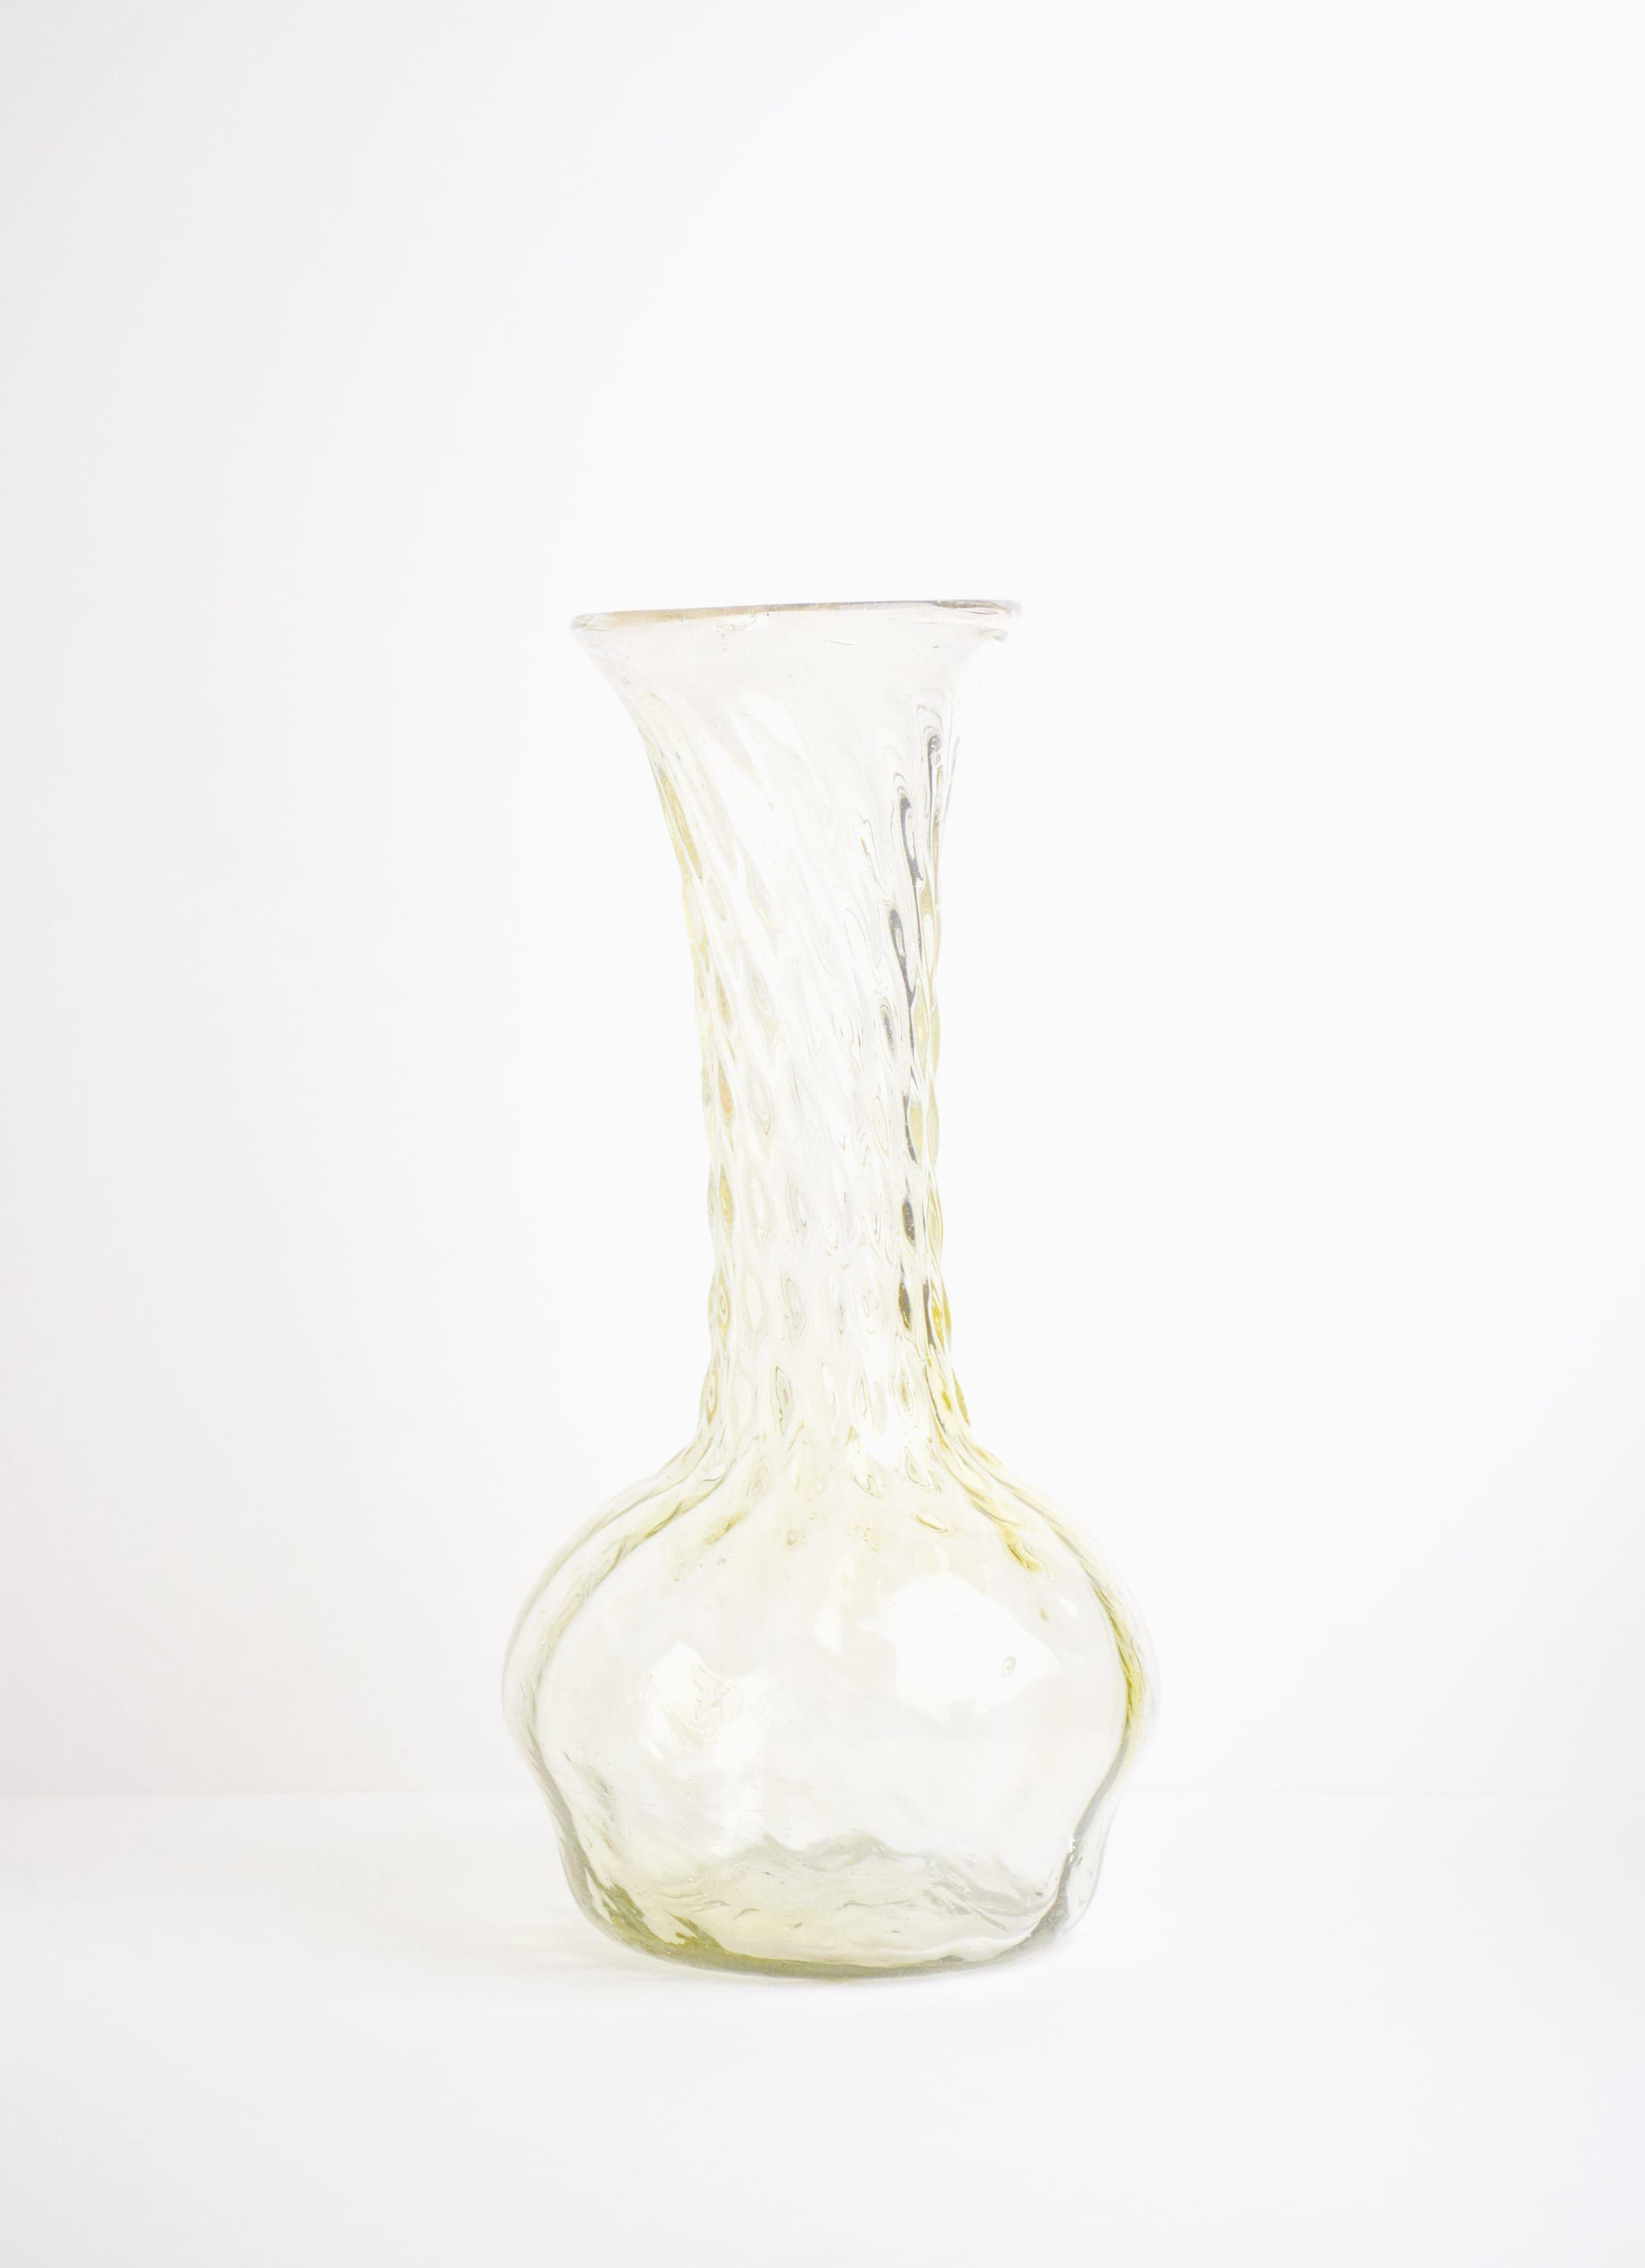 La Soufflerie - Twirl - Glass Vase - yellow